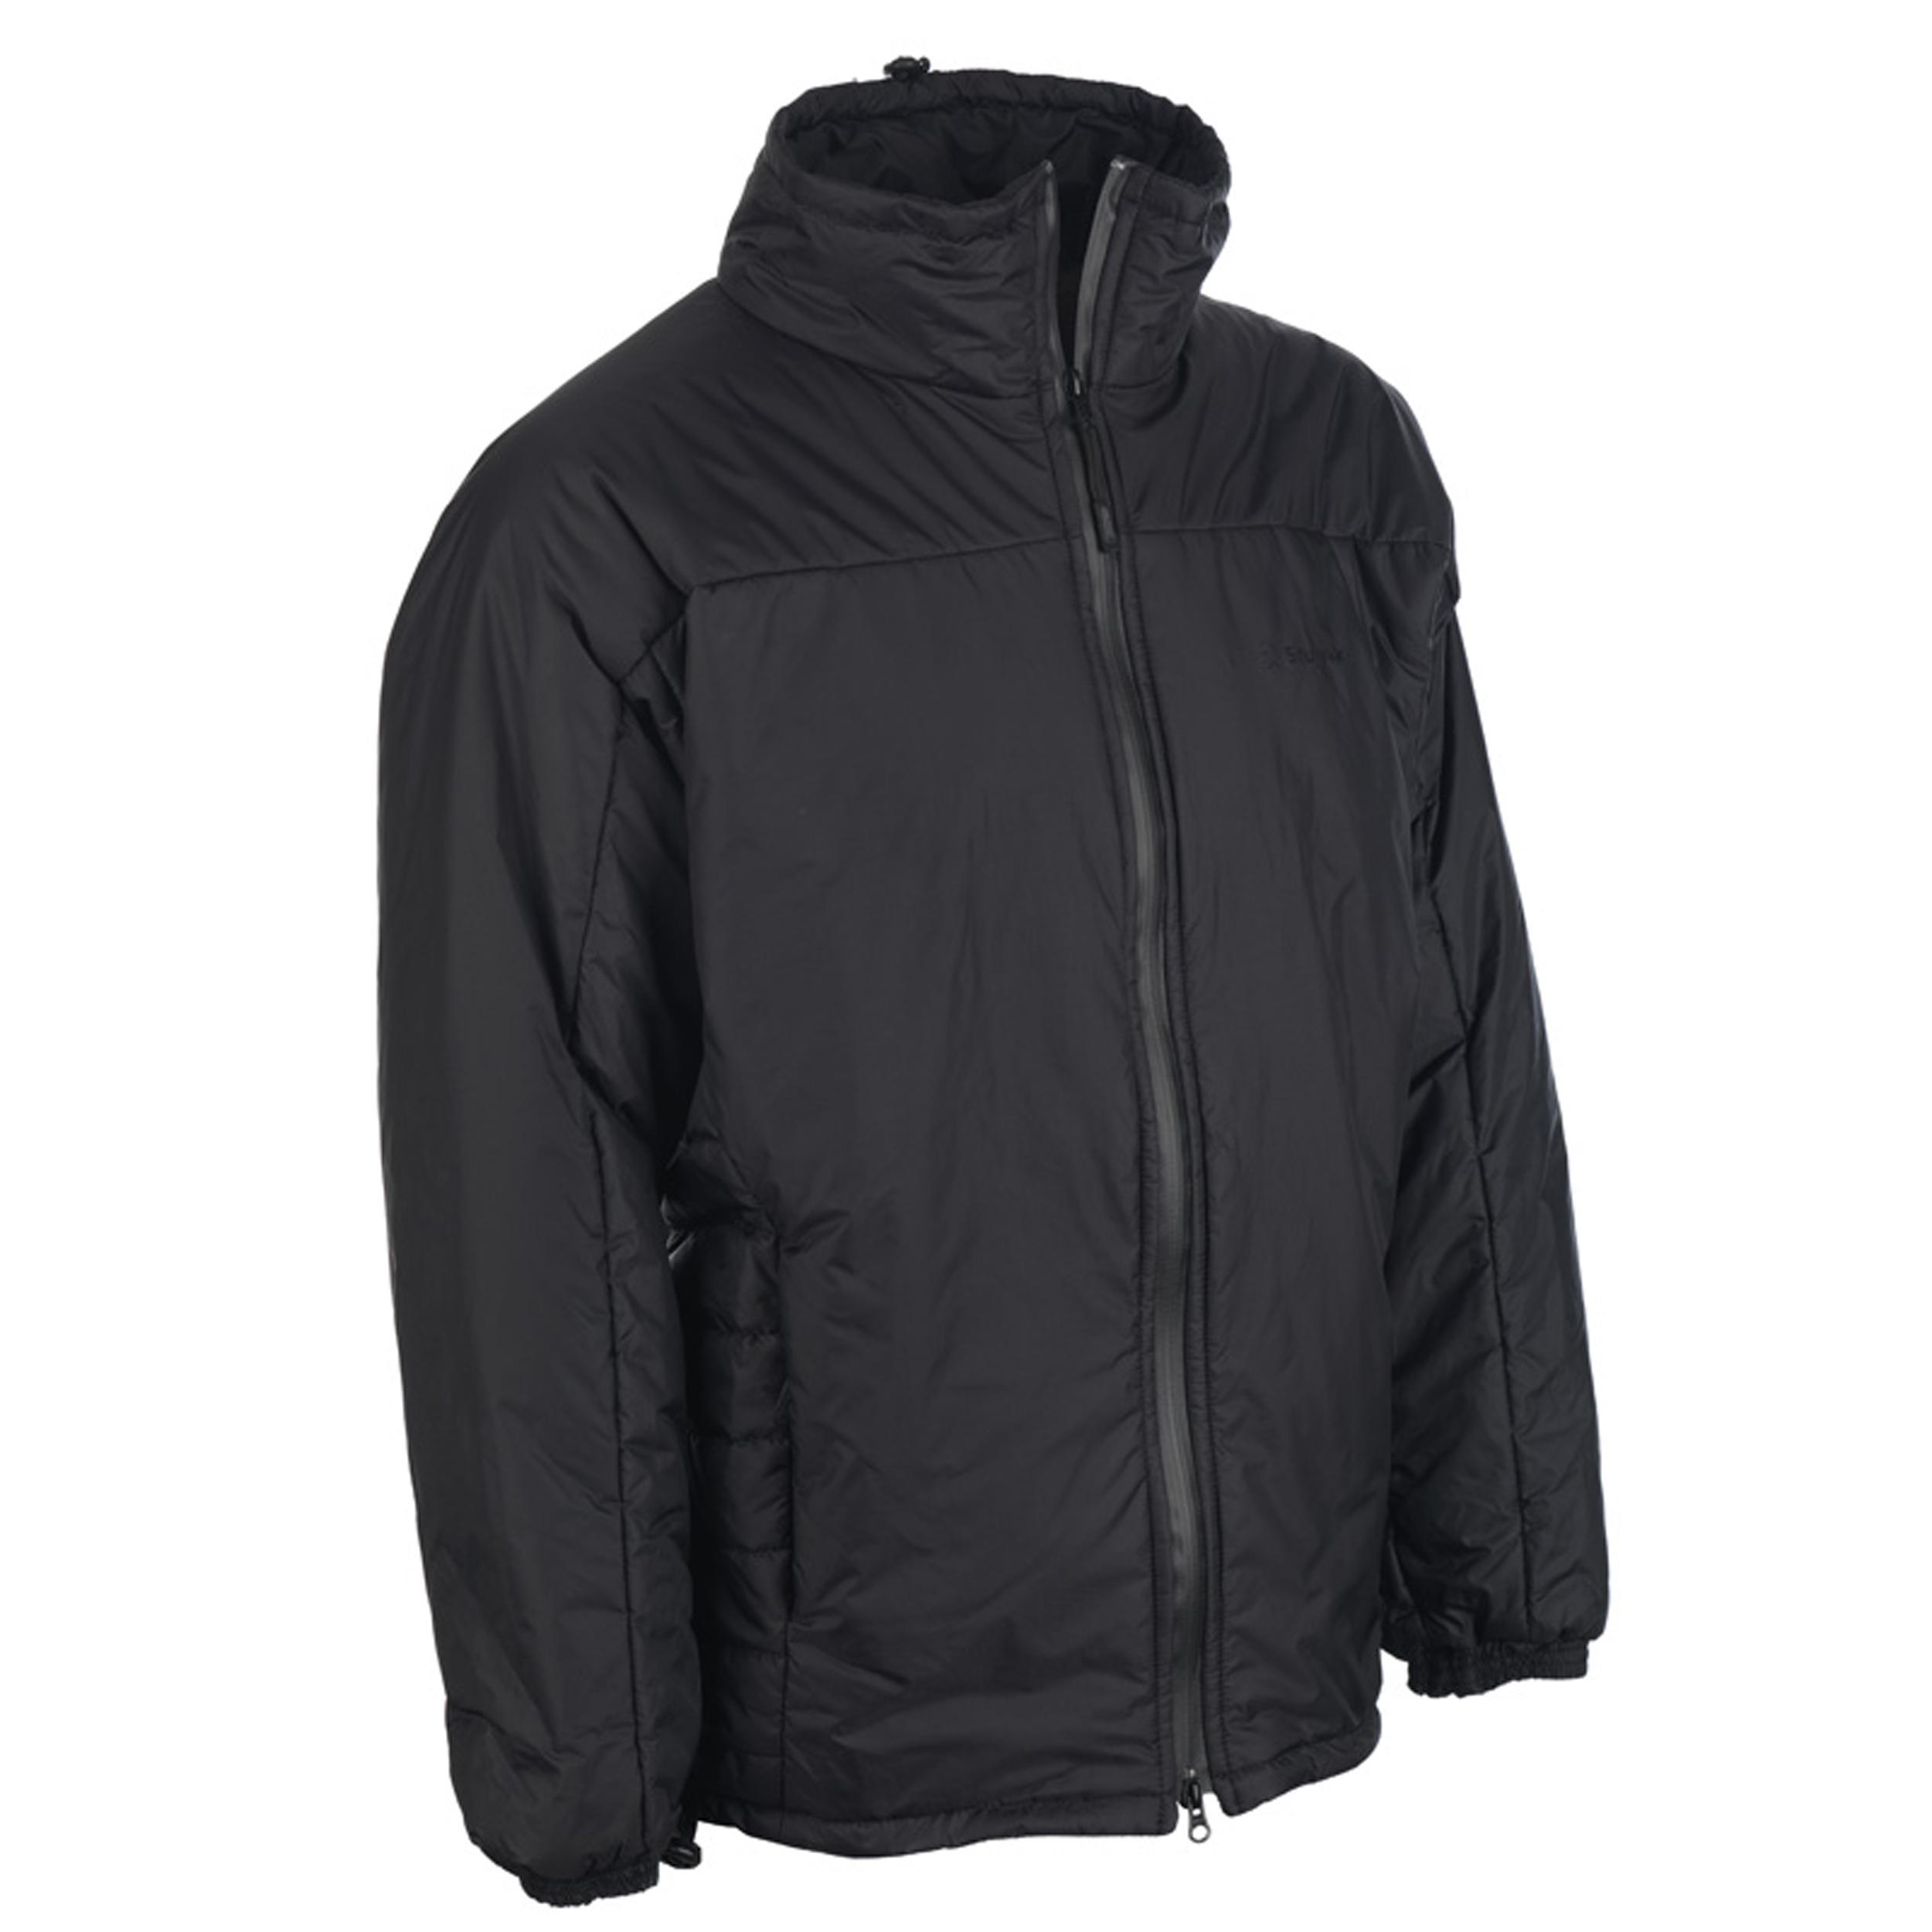 Snugpak Sj6 Jacket Black Xl